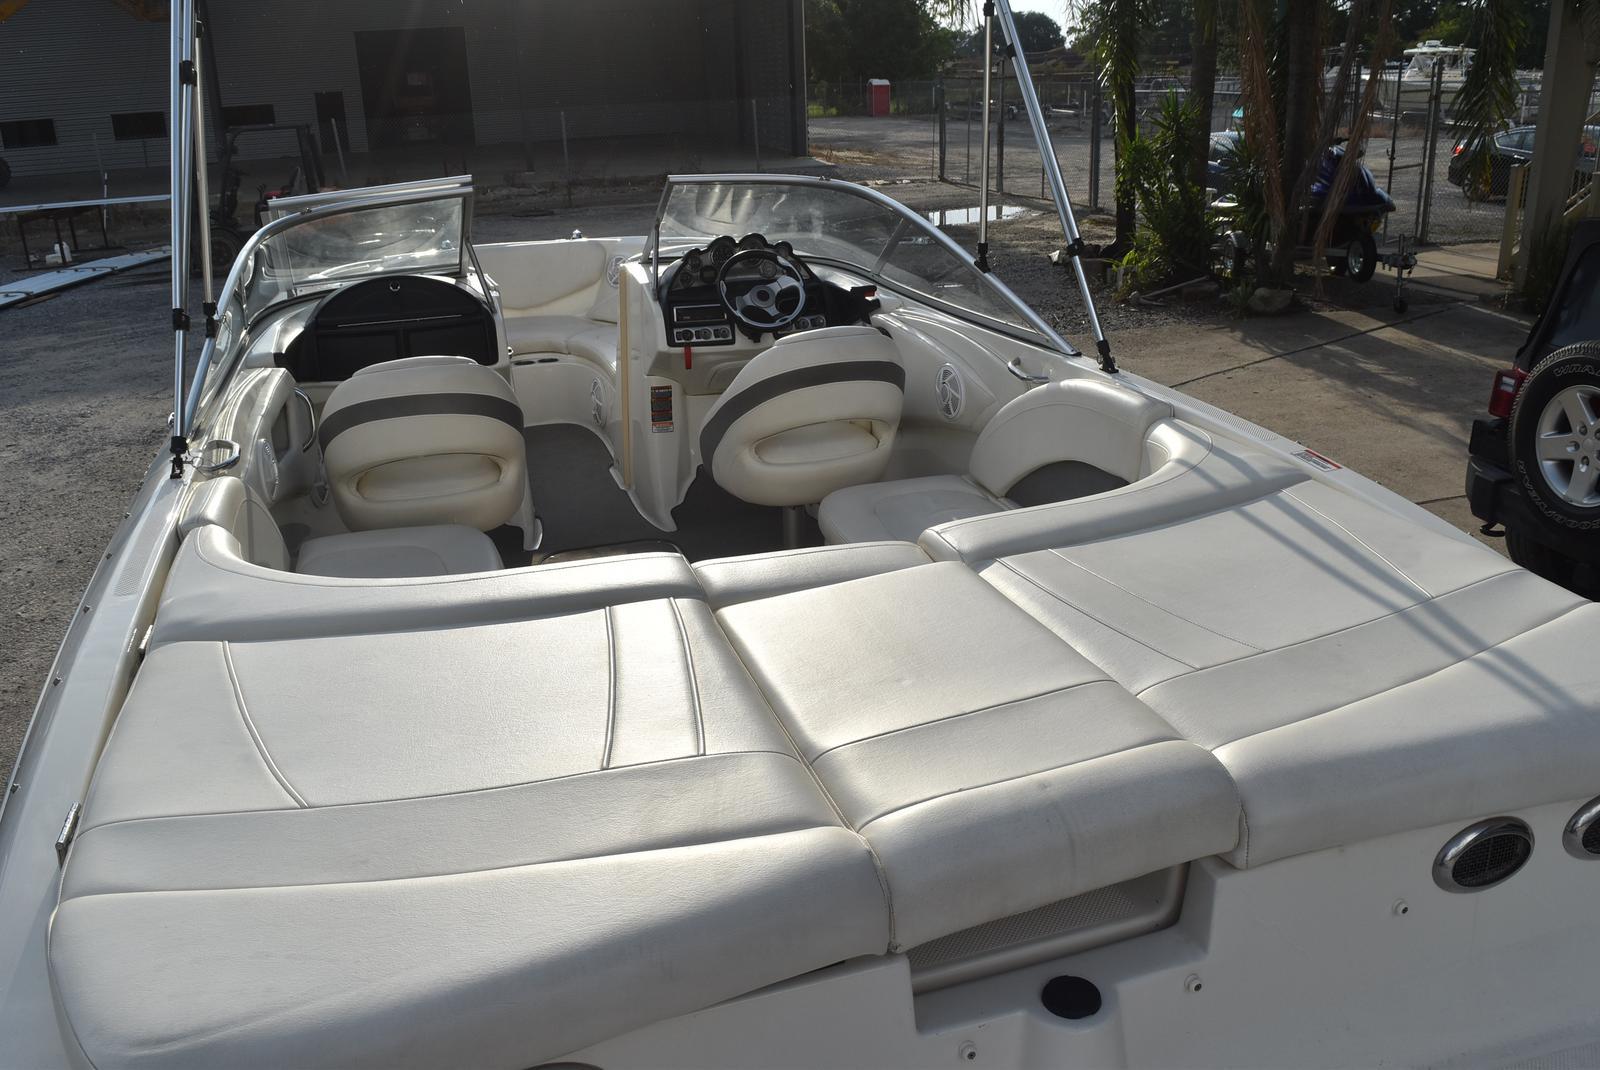 2010 Bayliner boat for sale, model of the boat is 235BR & Image # 8 of 43